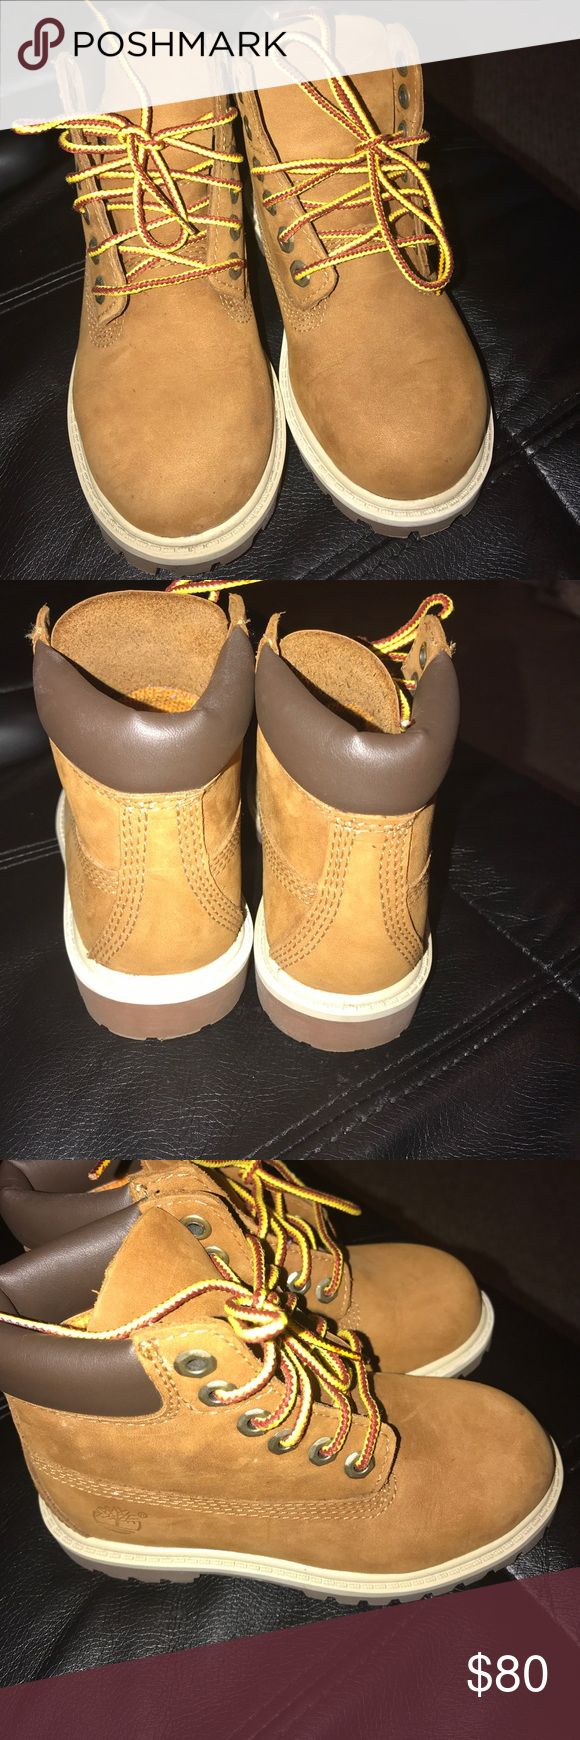 Timberland Brand new toddler timberland boots no box Timberland Shoes Boots